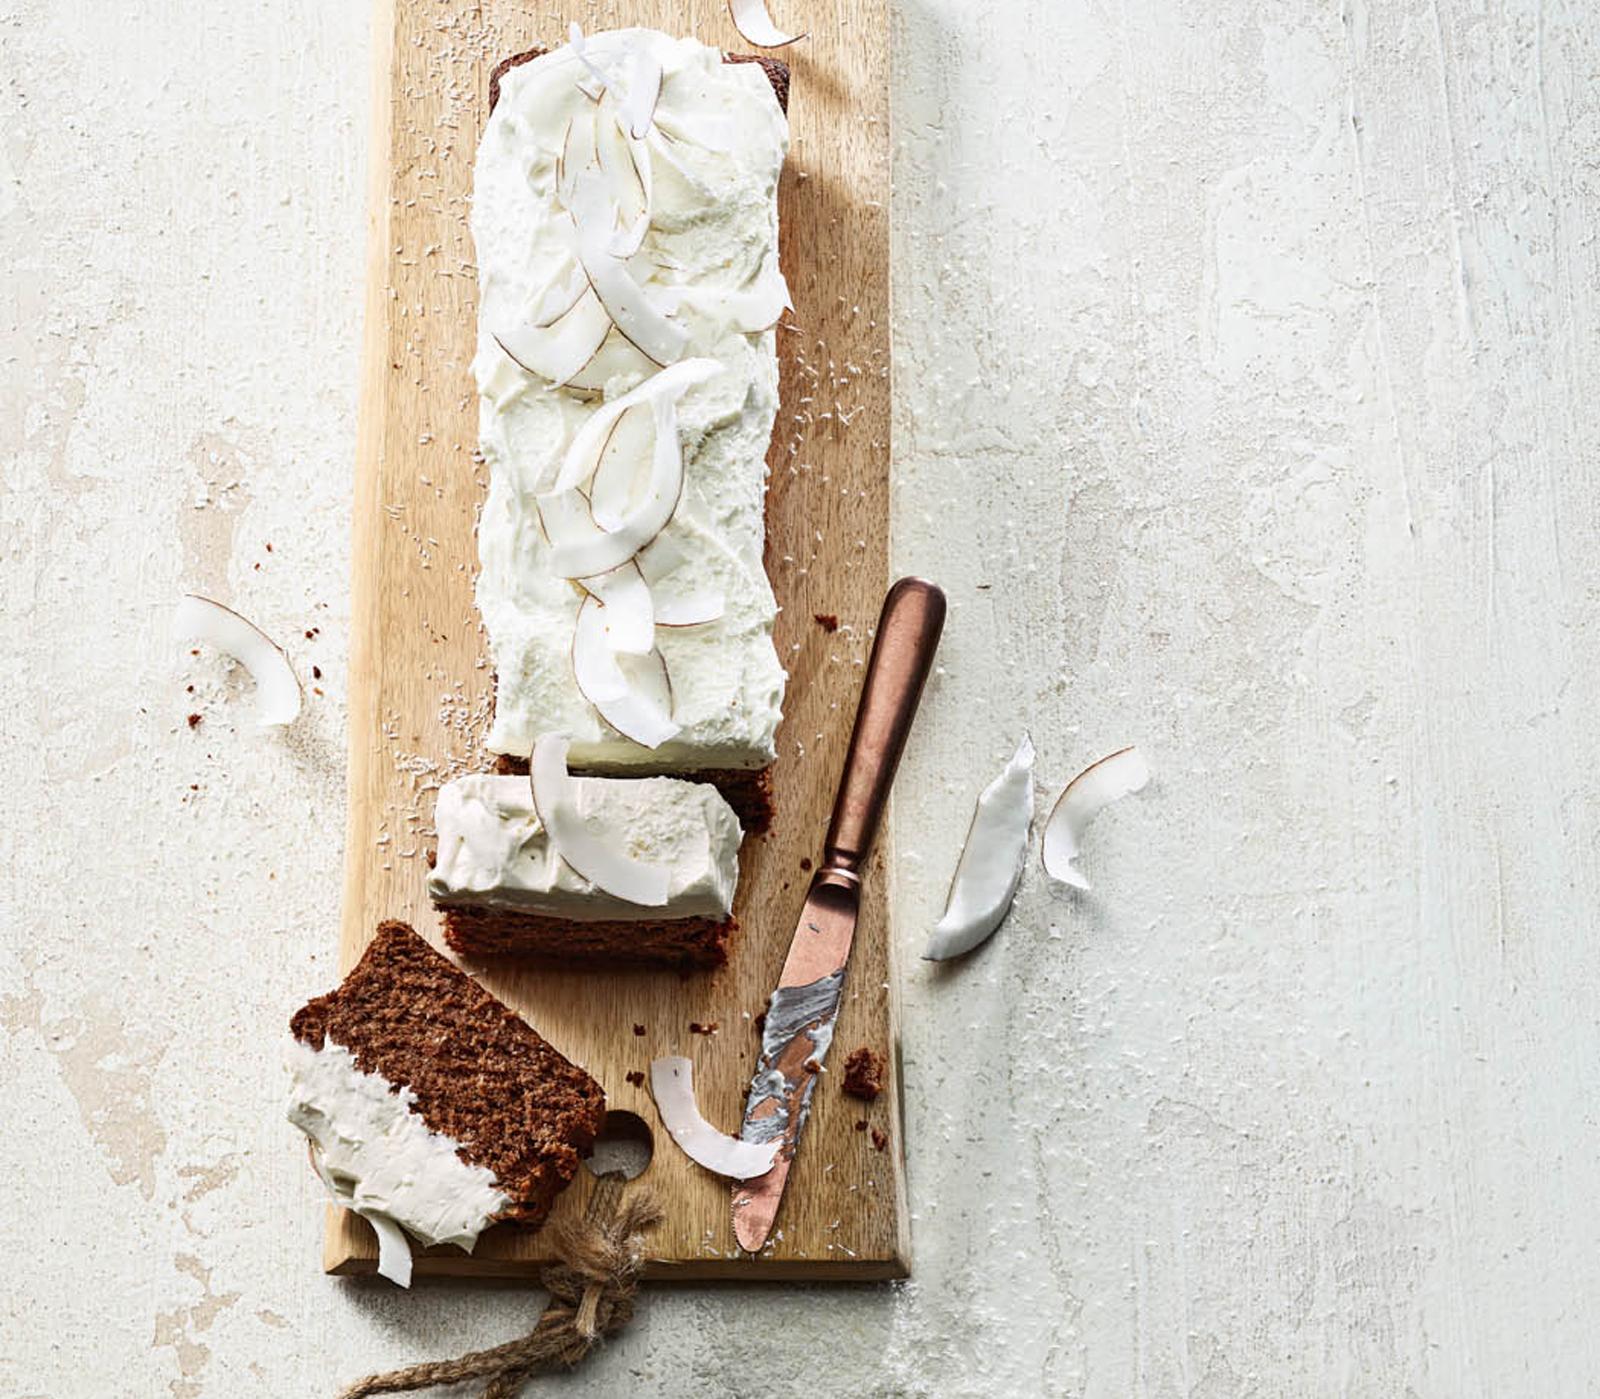 Kokos-Schokoladen-Schnitten